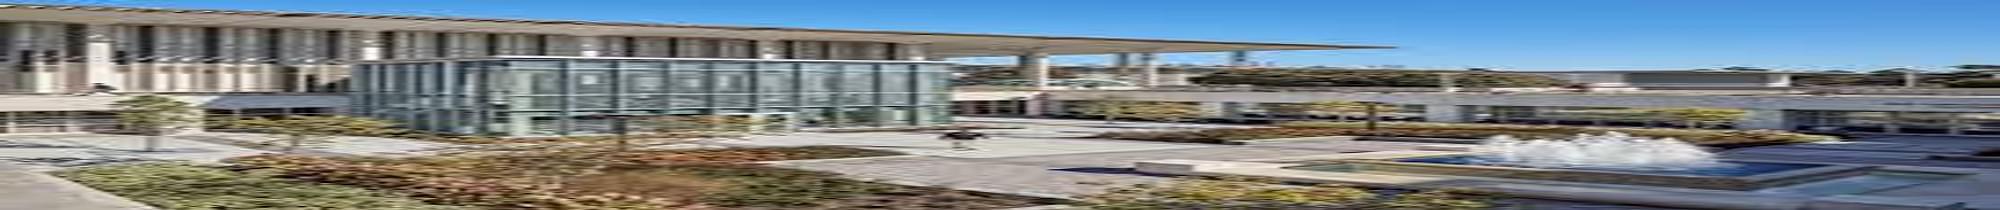 Ualbany Academic Calendar Spring 2022.University At Albany Suny Albany Albany Admission Criteria Application Deadlines 2021